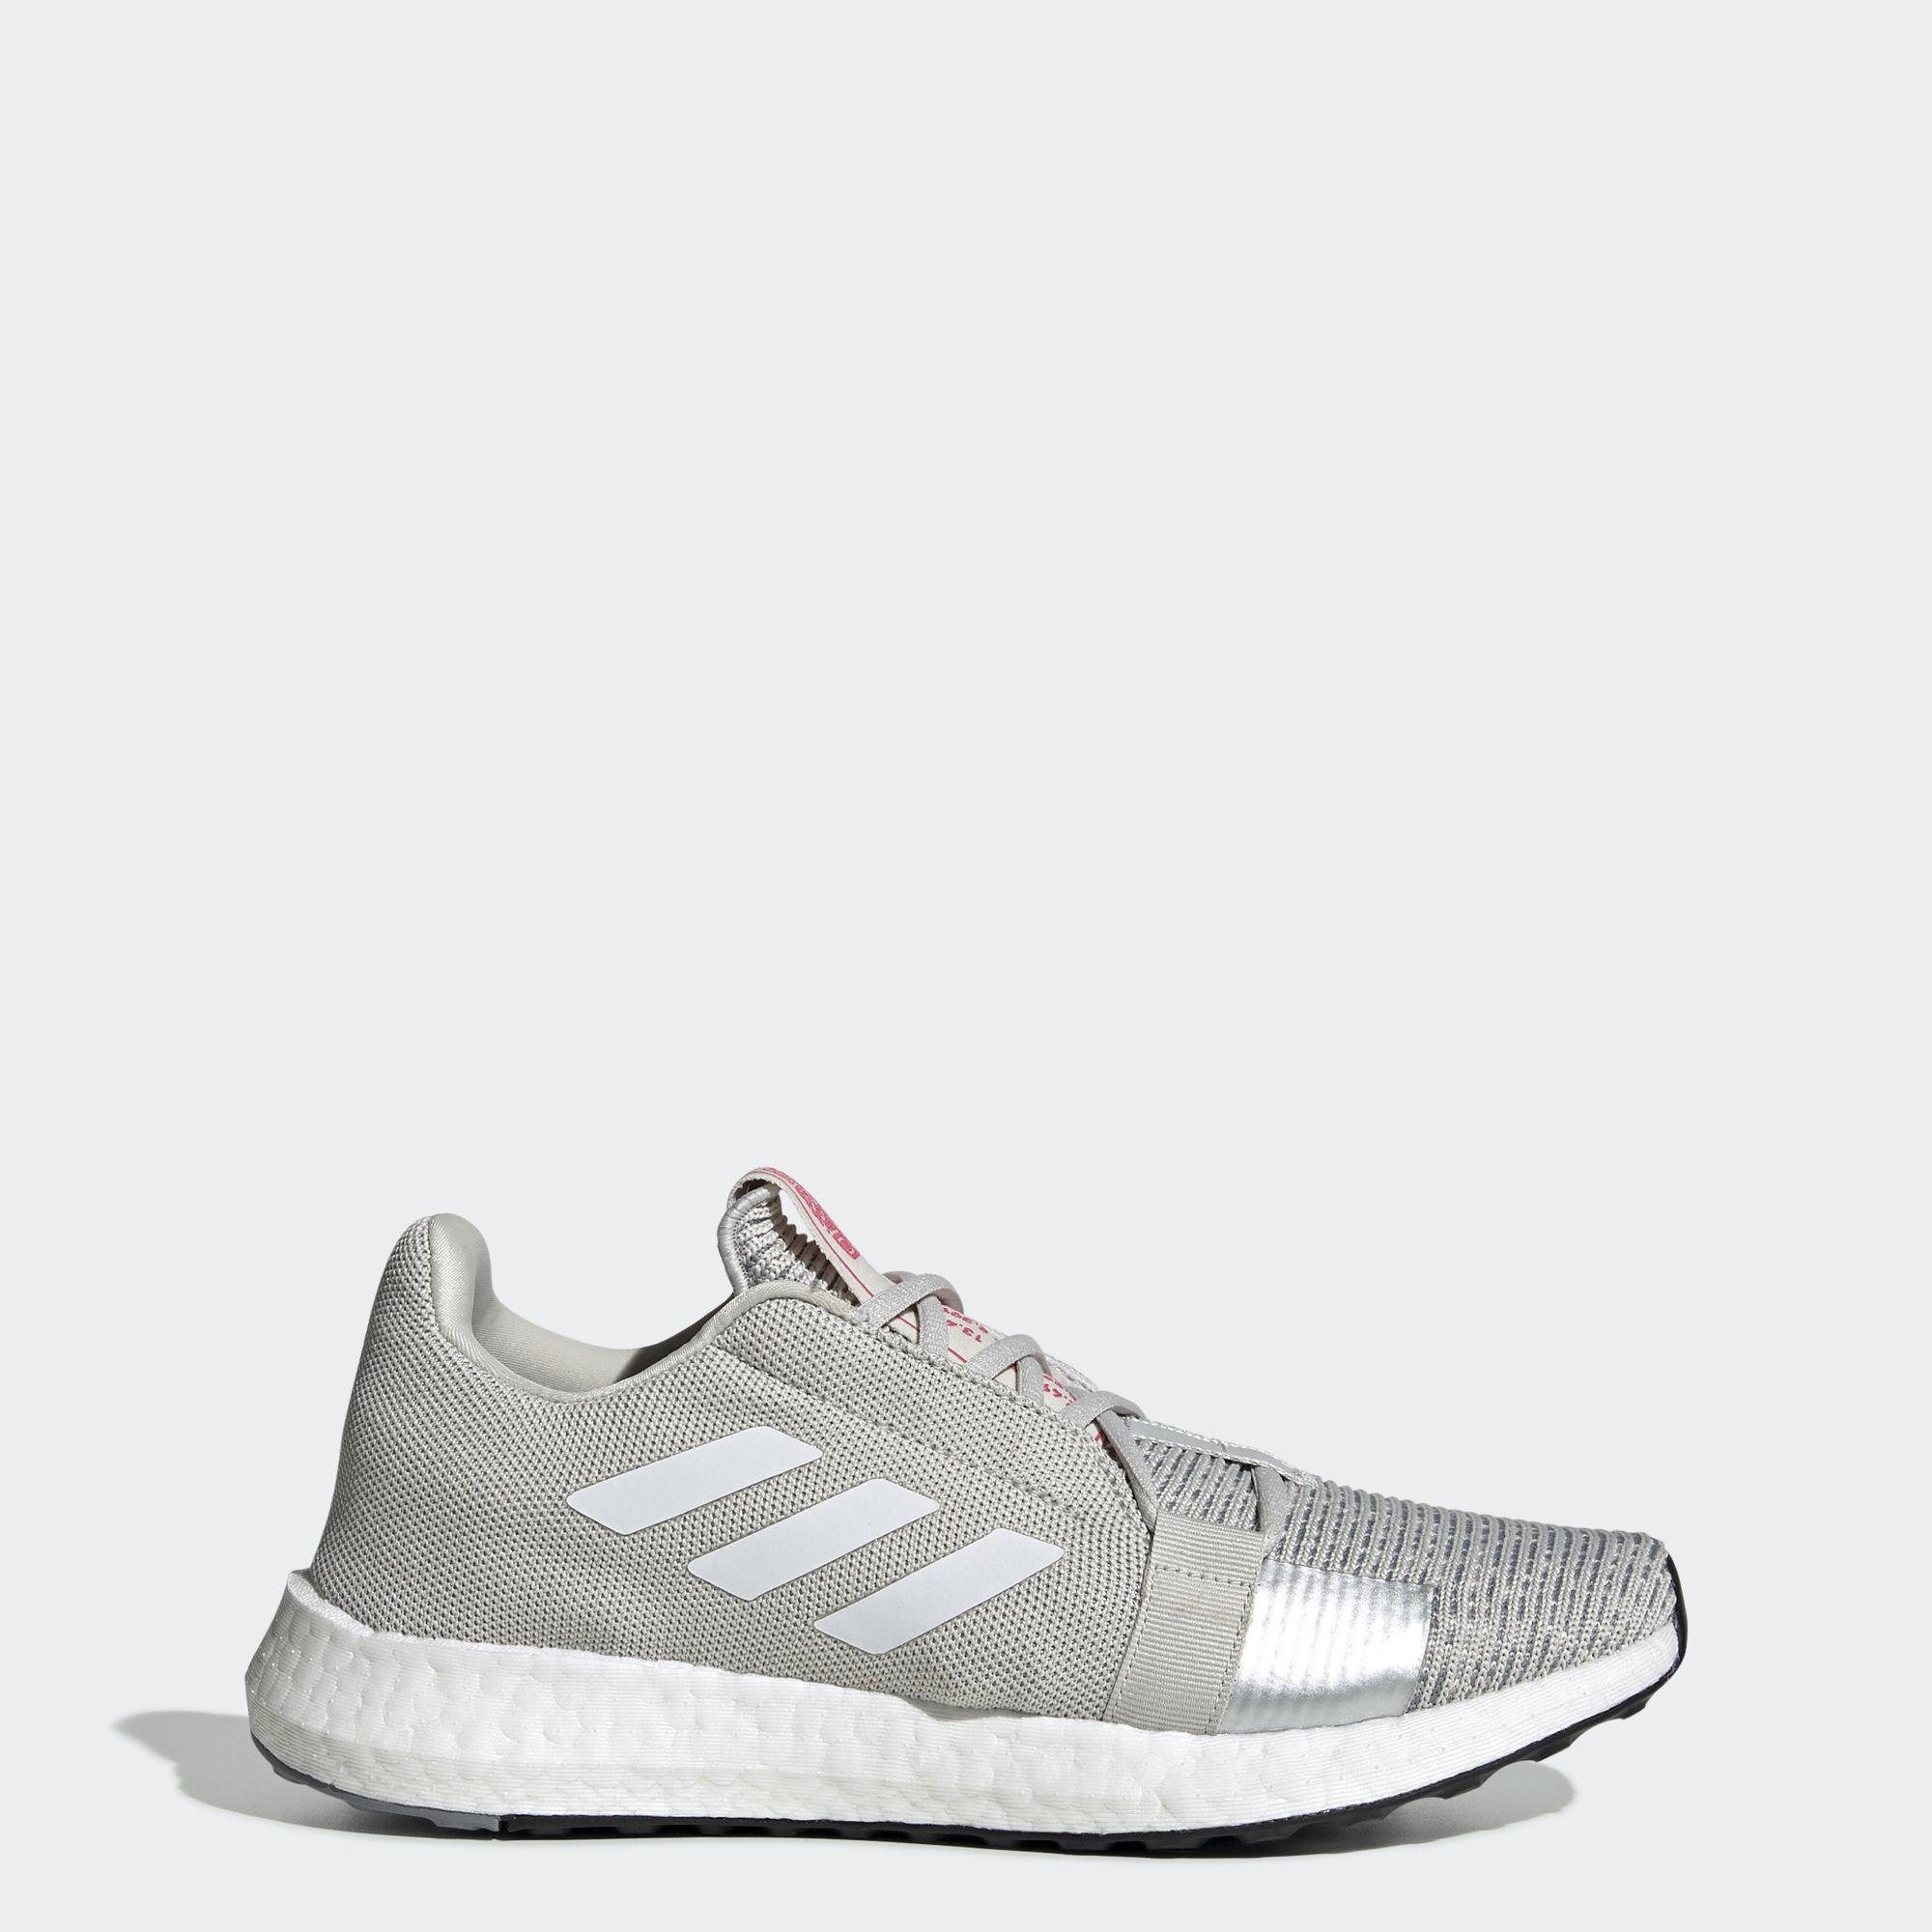 Giày Thể Thao adidas RUNNING Senseboost Go Nữ EF1579